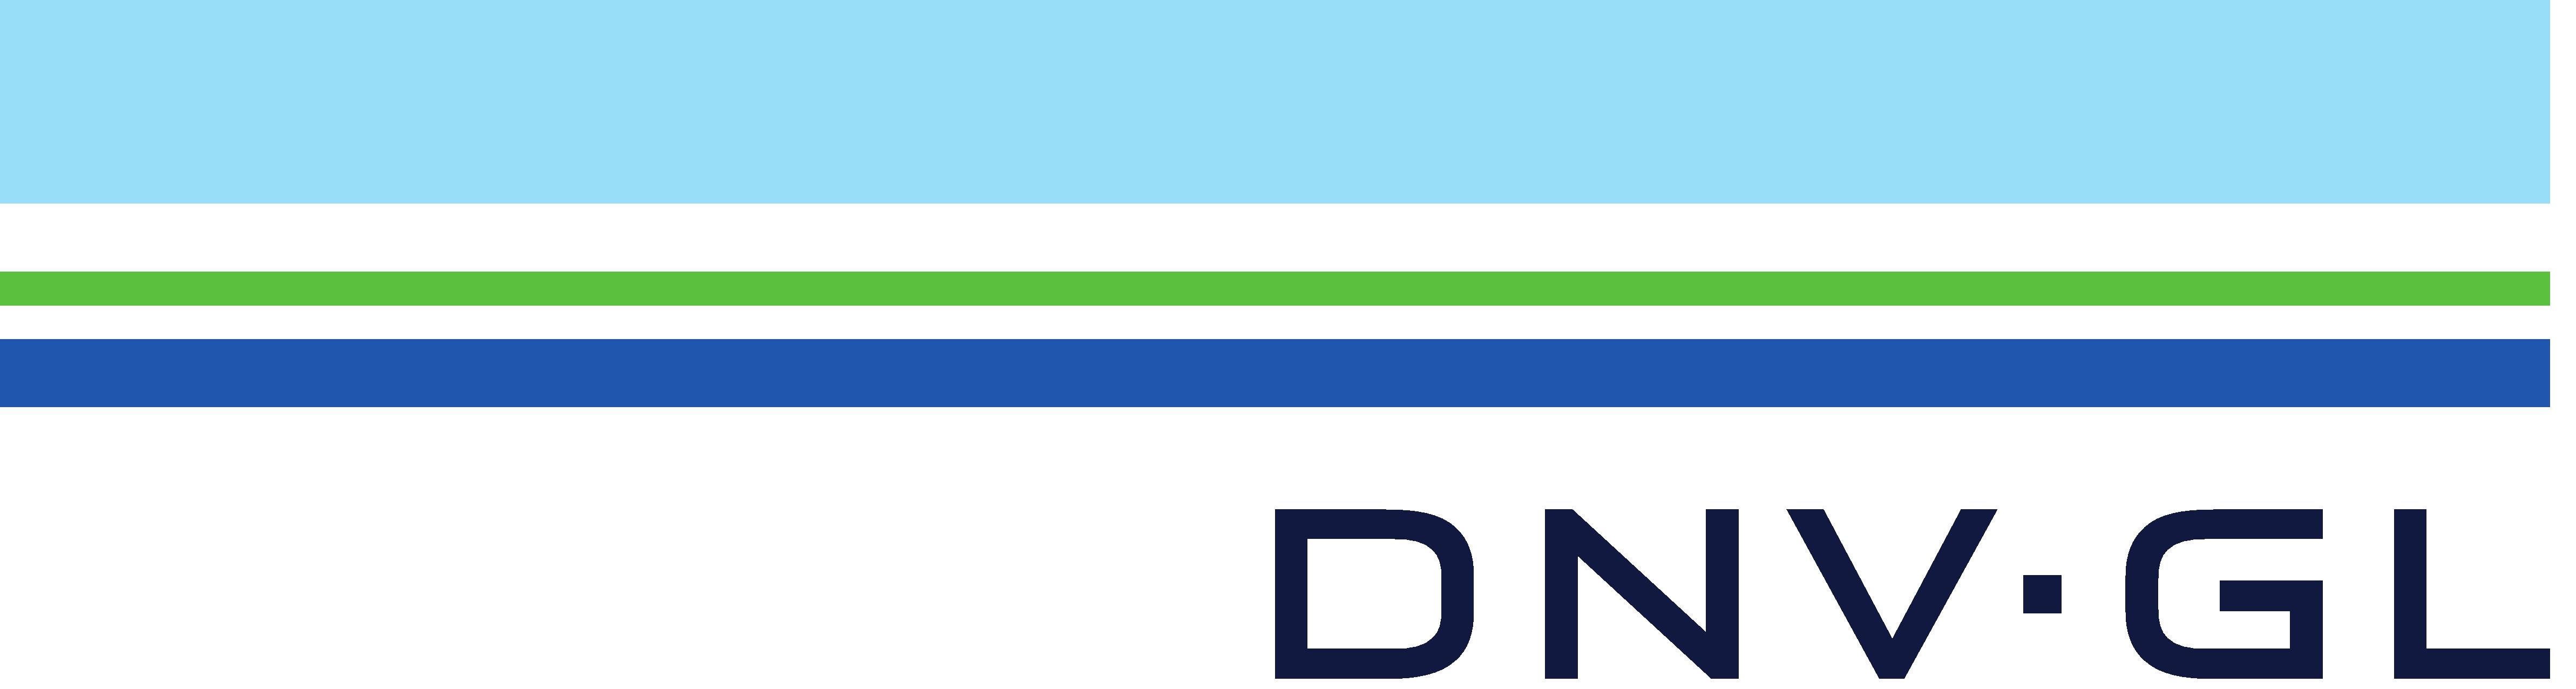 https://secureservercdn.net/198.71.233.106/g5c.503.myftpupload.com/wp-content/uploads/2019/09/DNV-logo.jpg